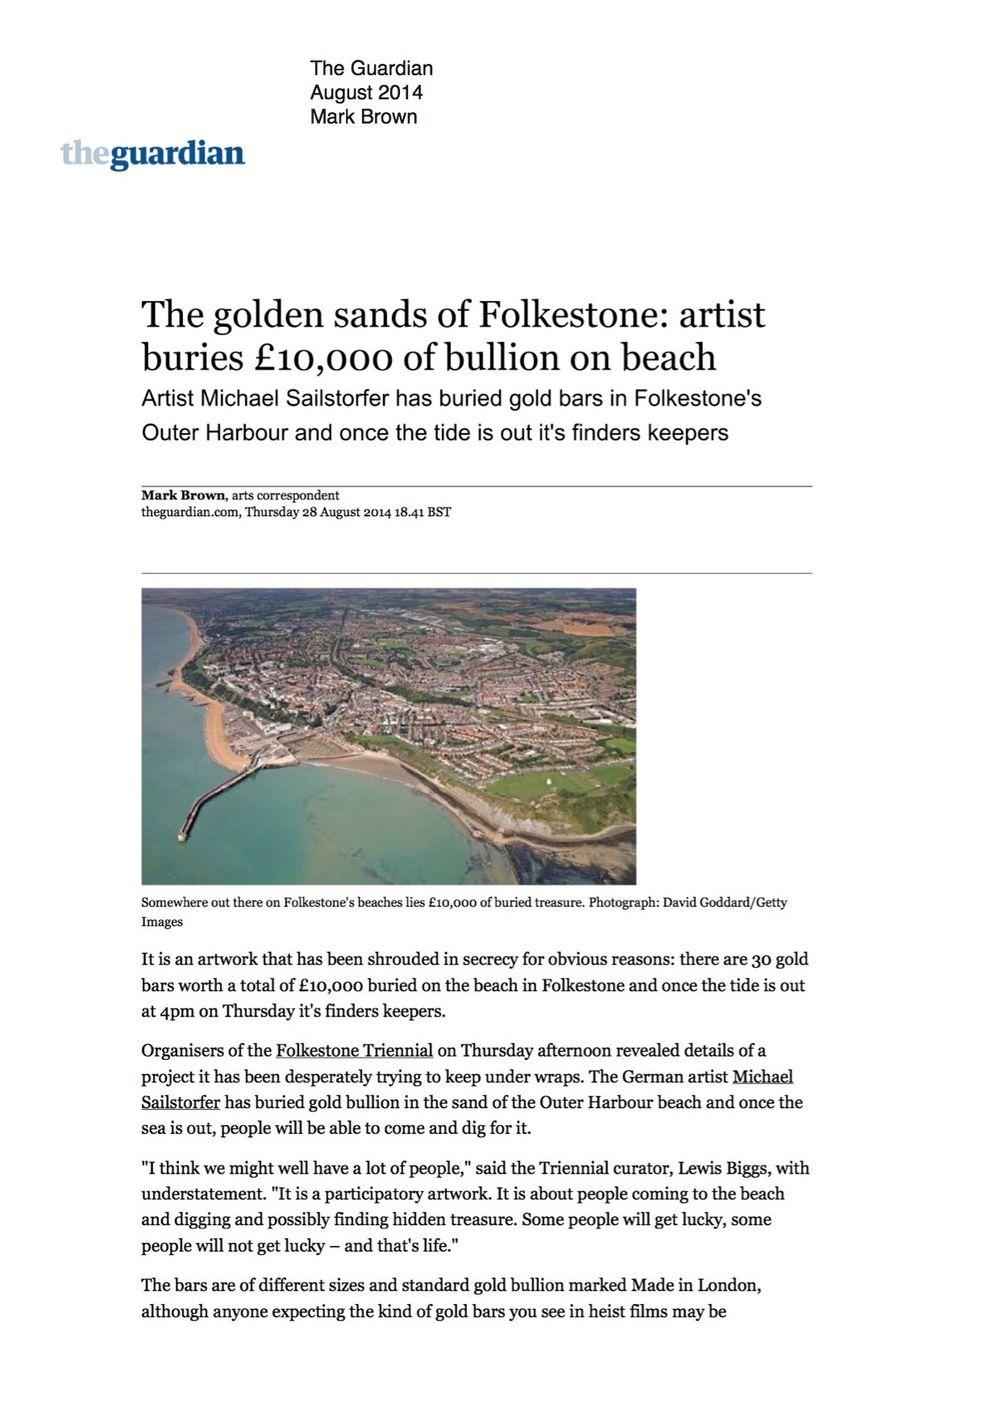 The Guardian | Michael SAILSTORFER